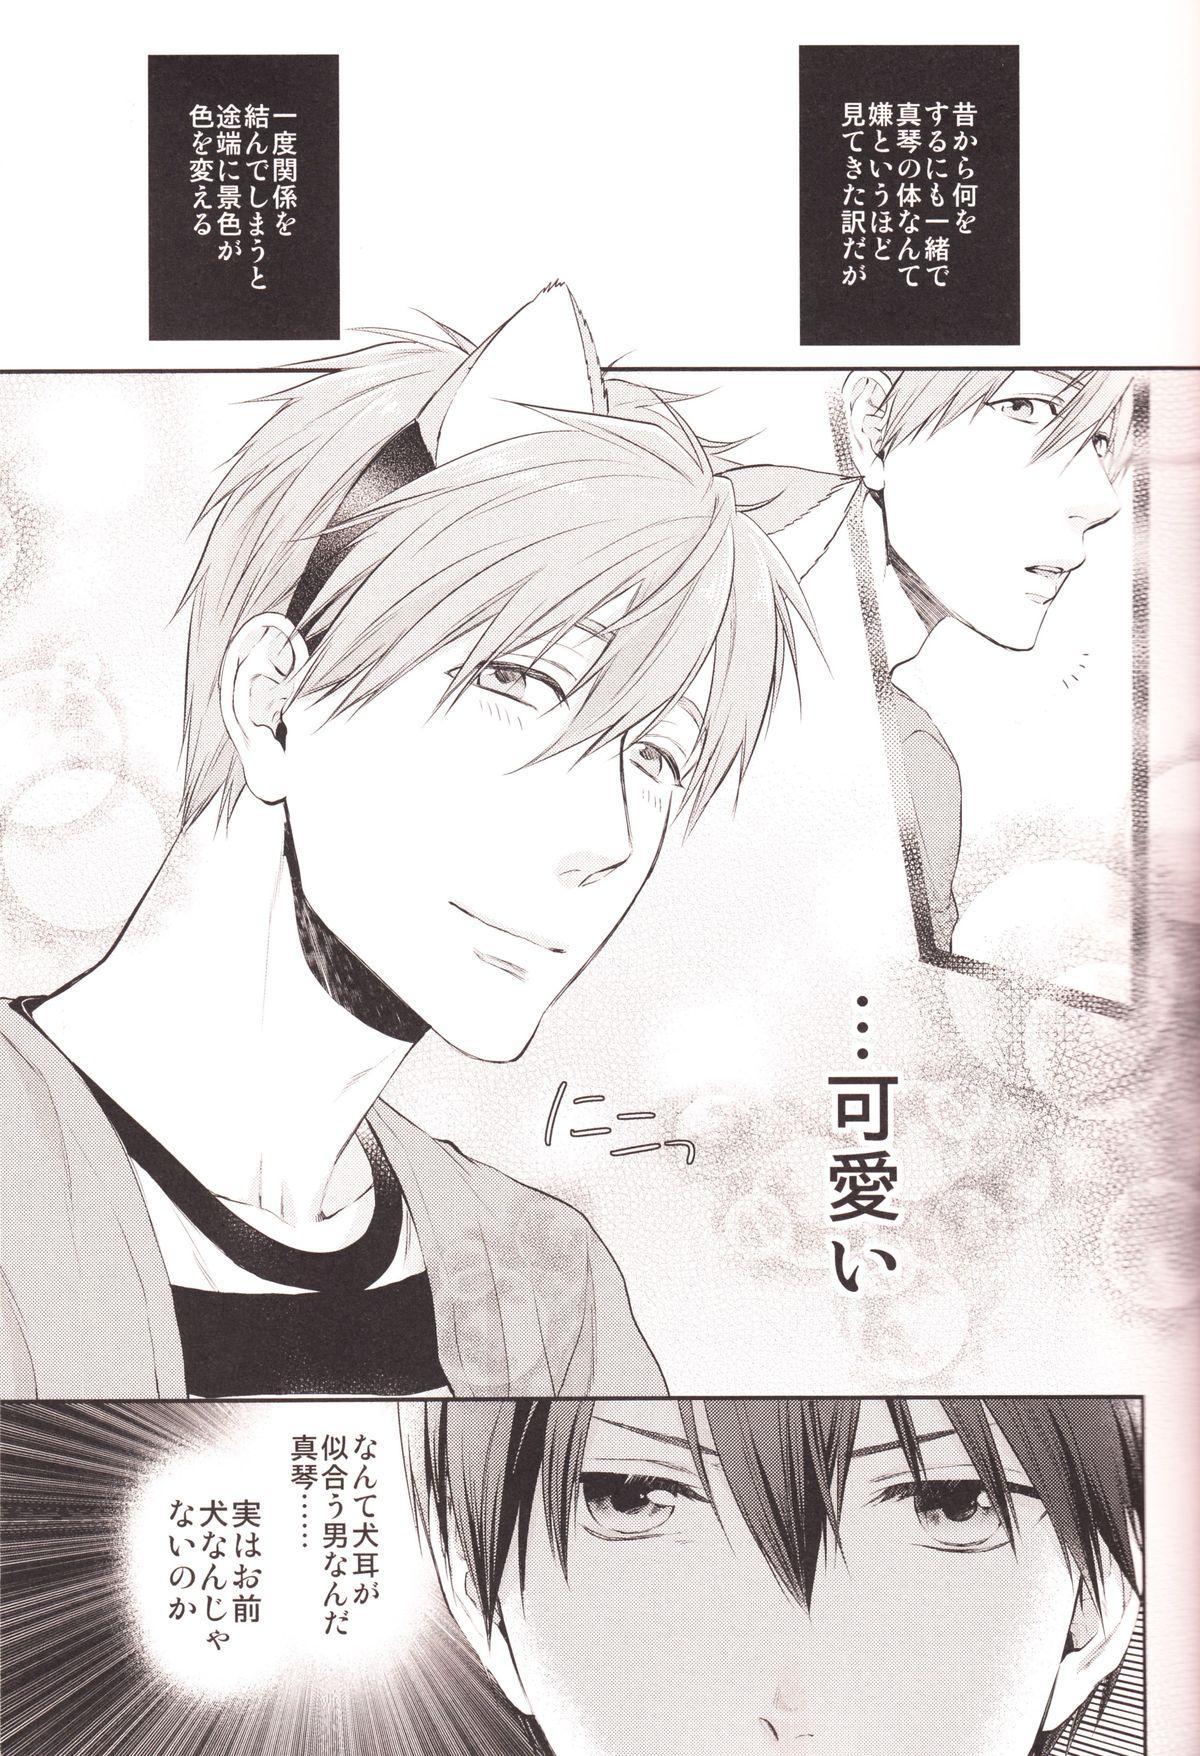 Haru-chan no Wanko 9